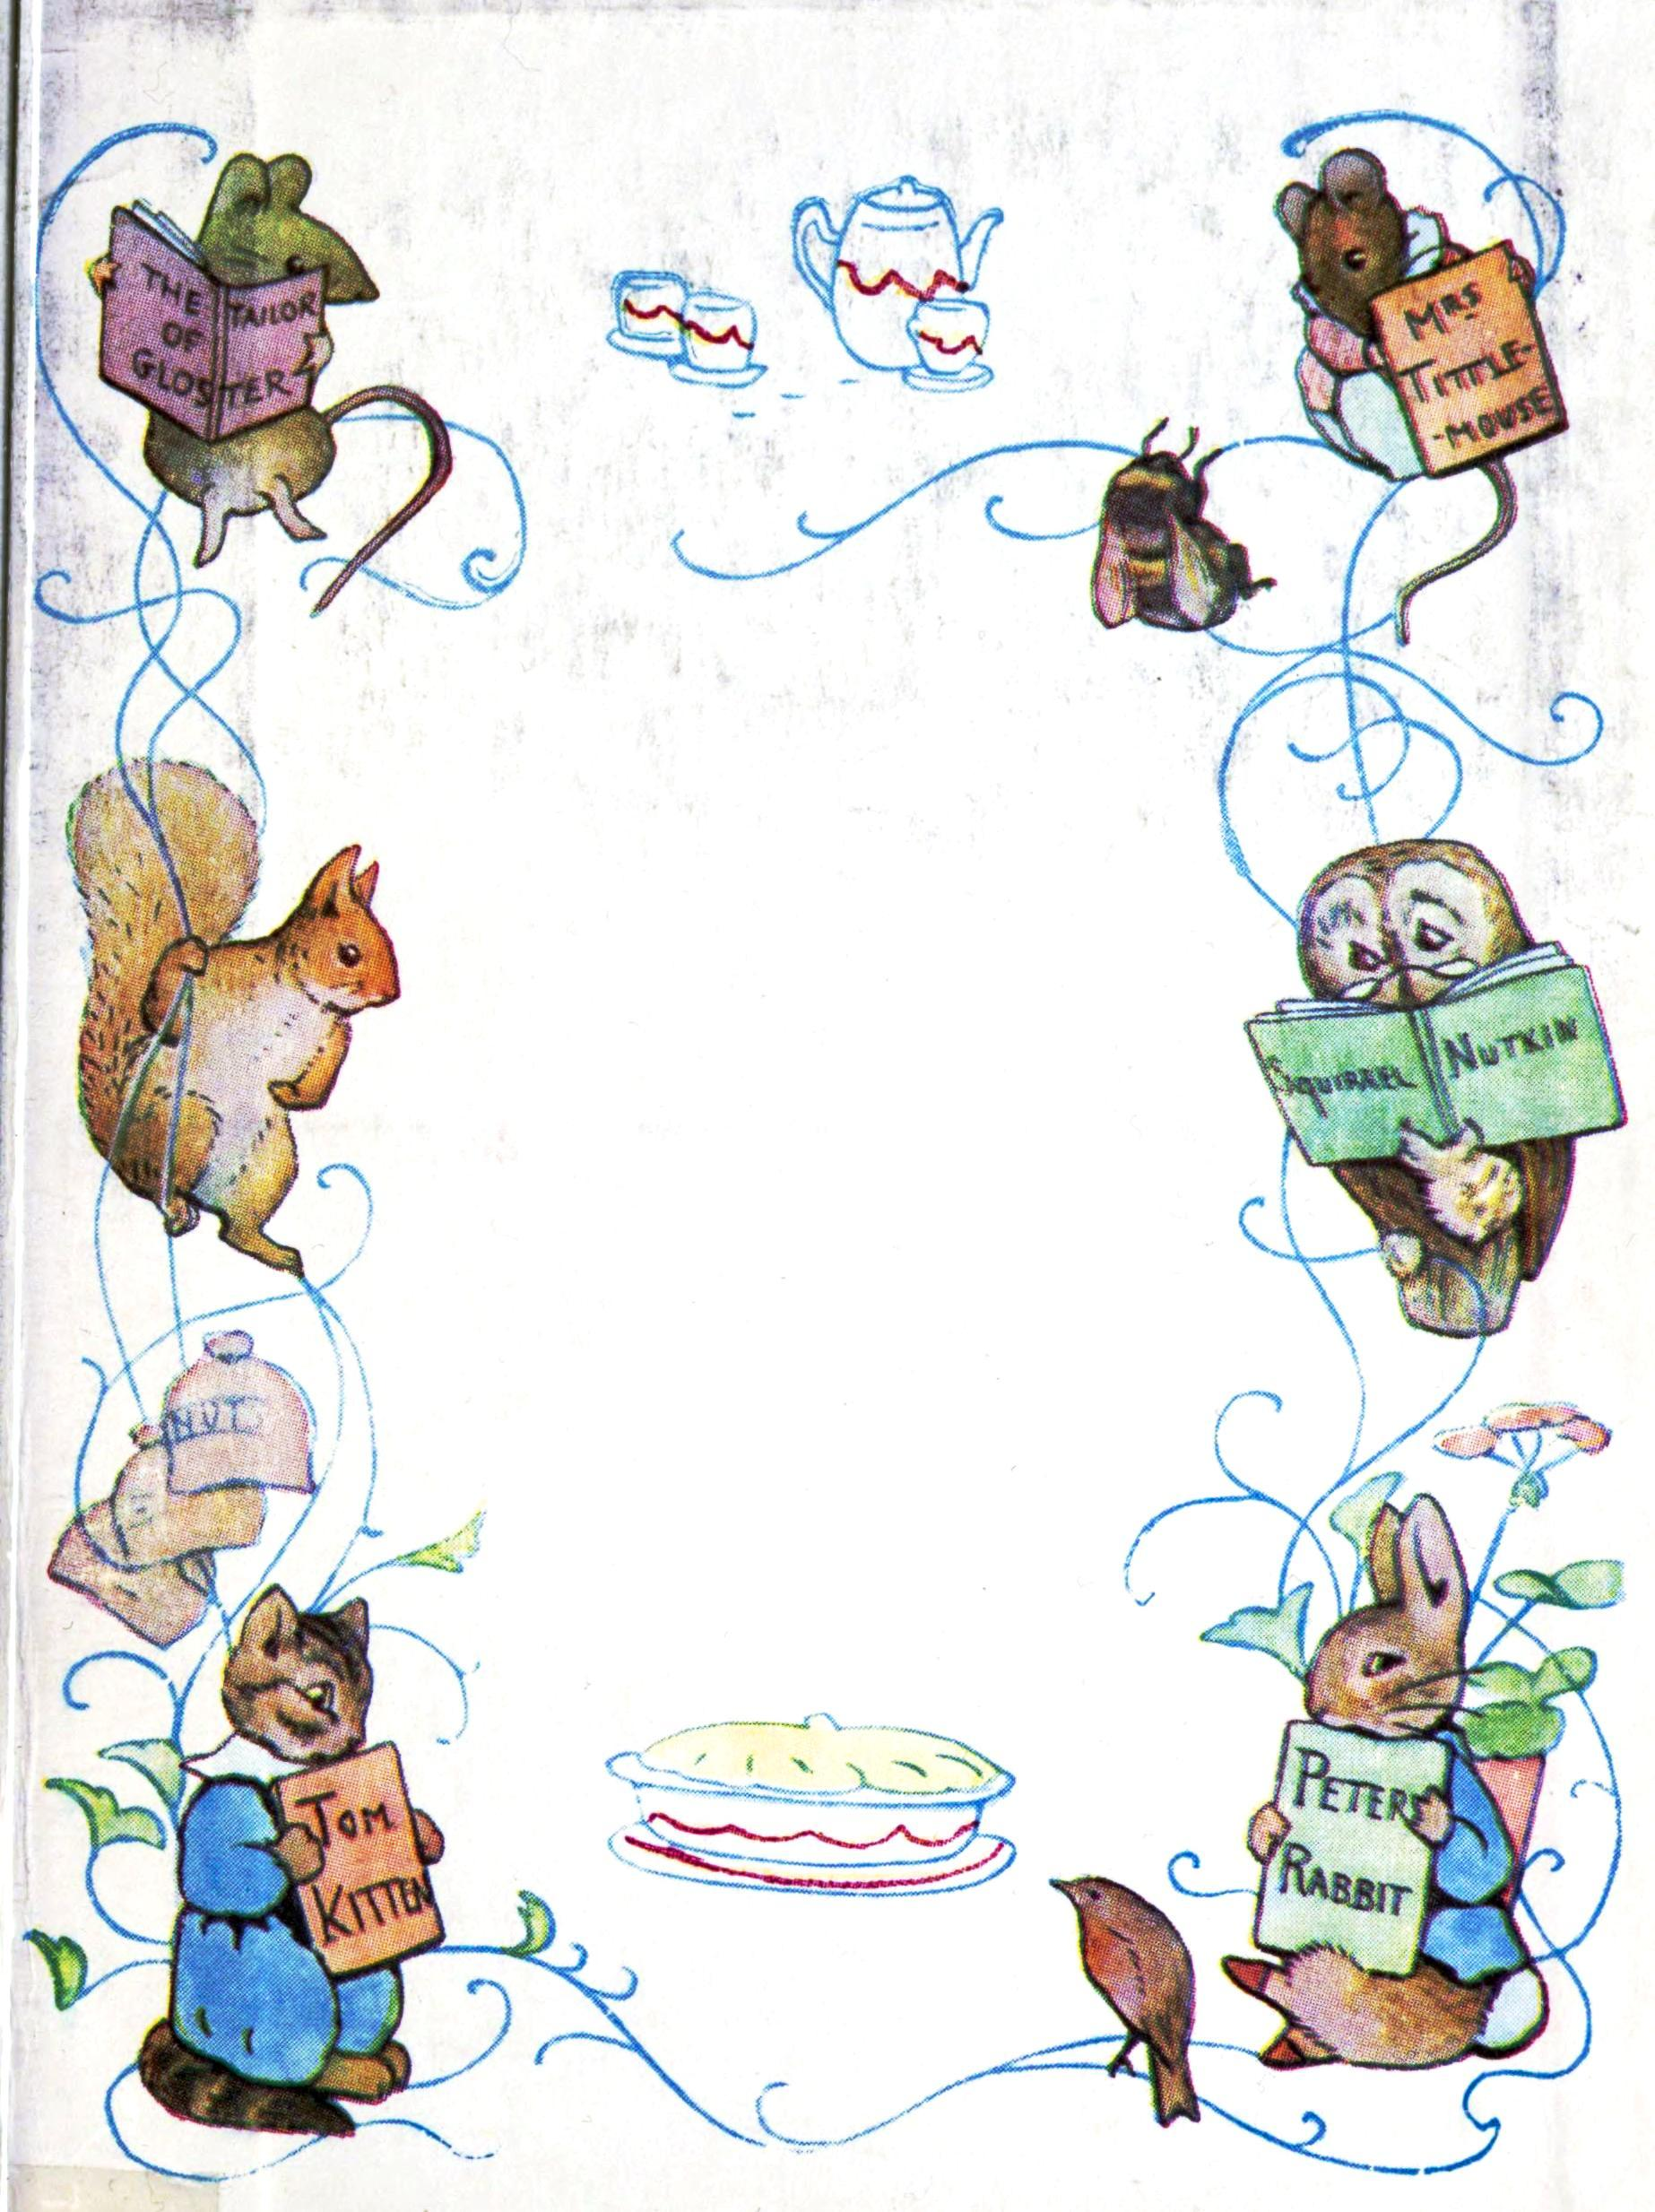 Peter Rabbit Wallpapers Wallpaper Cave